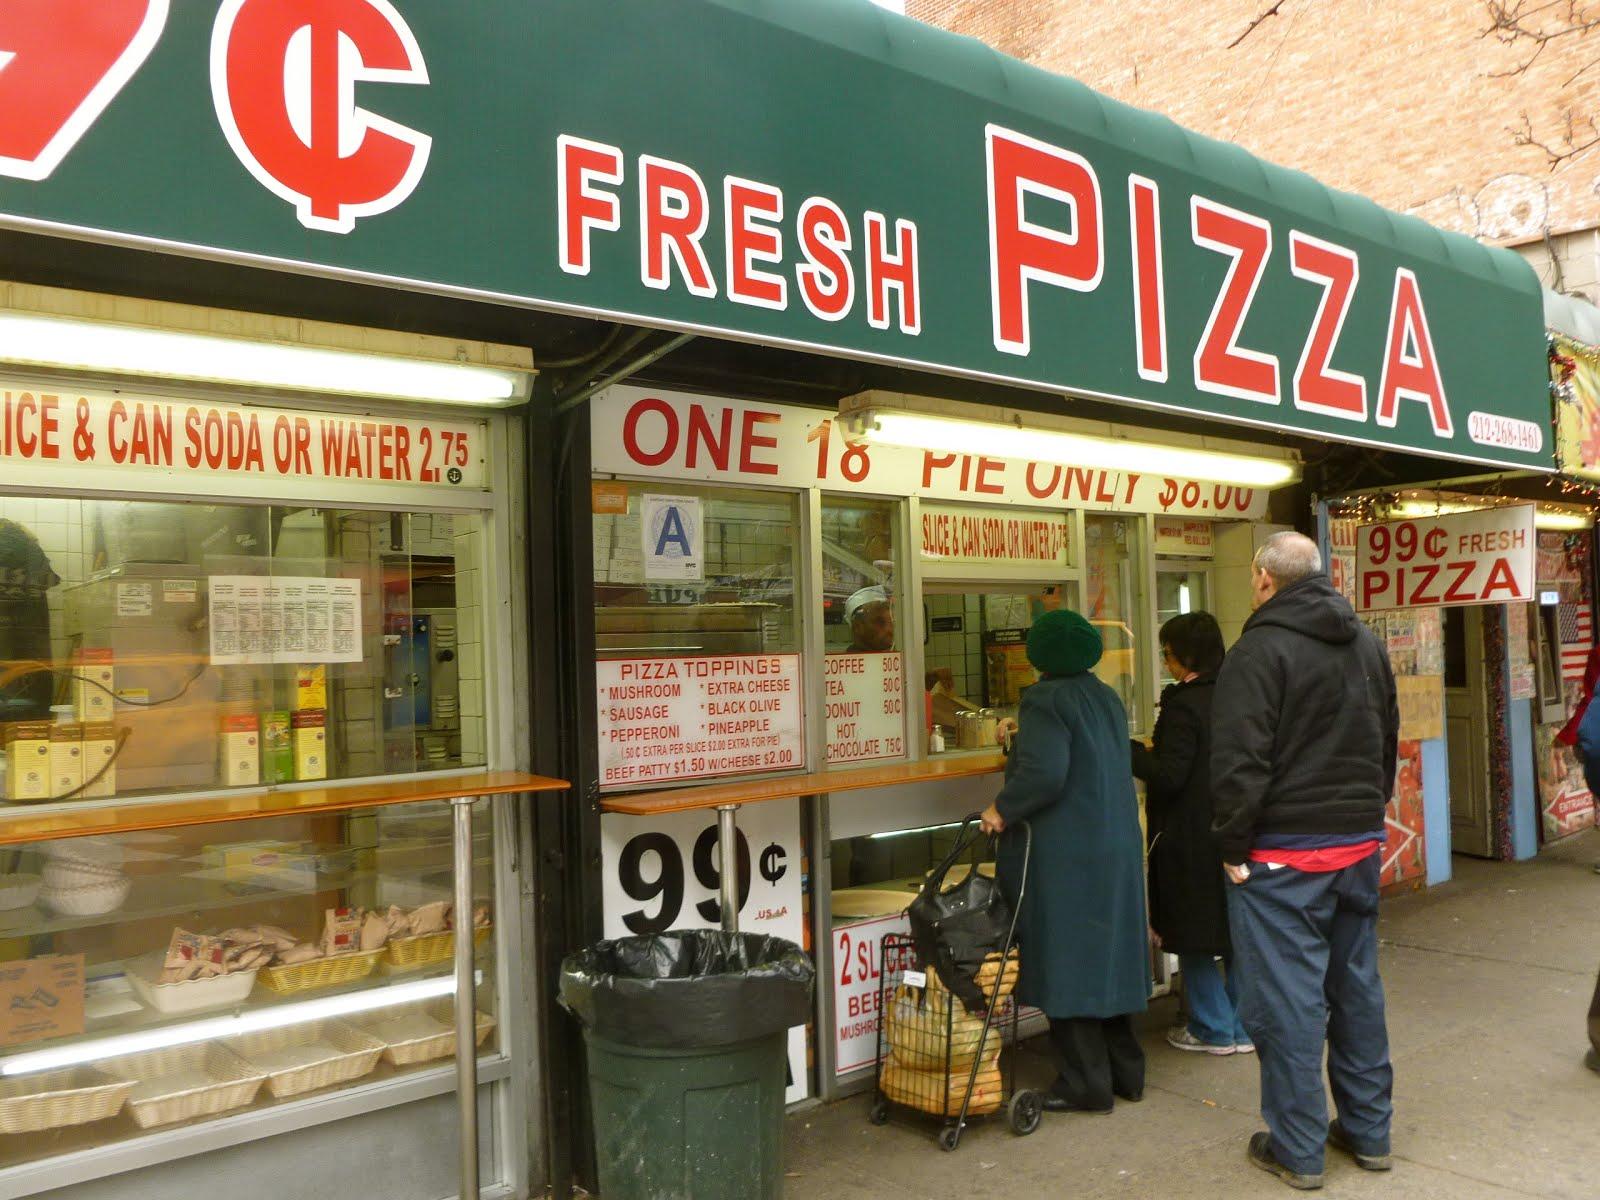 Jeremiahs Vanishing New York 99 Cent Fresh Pizza